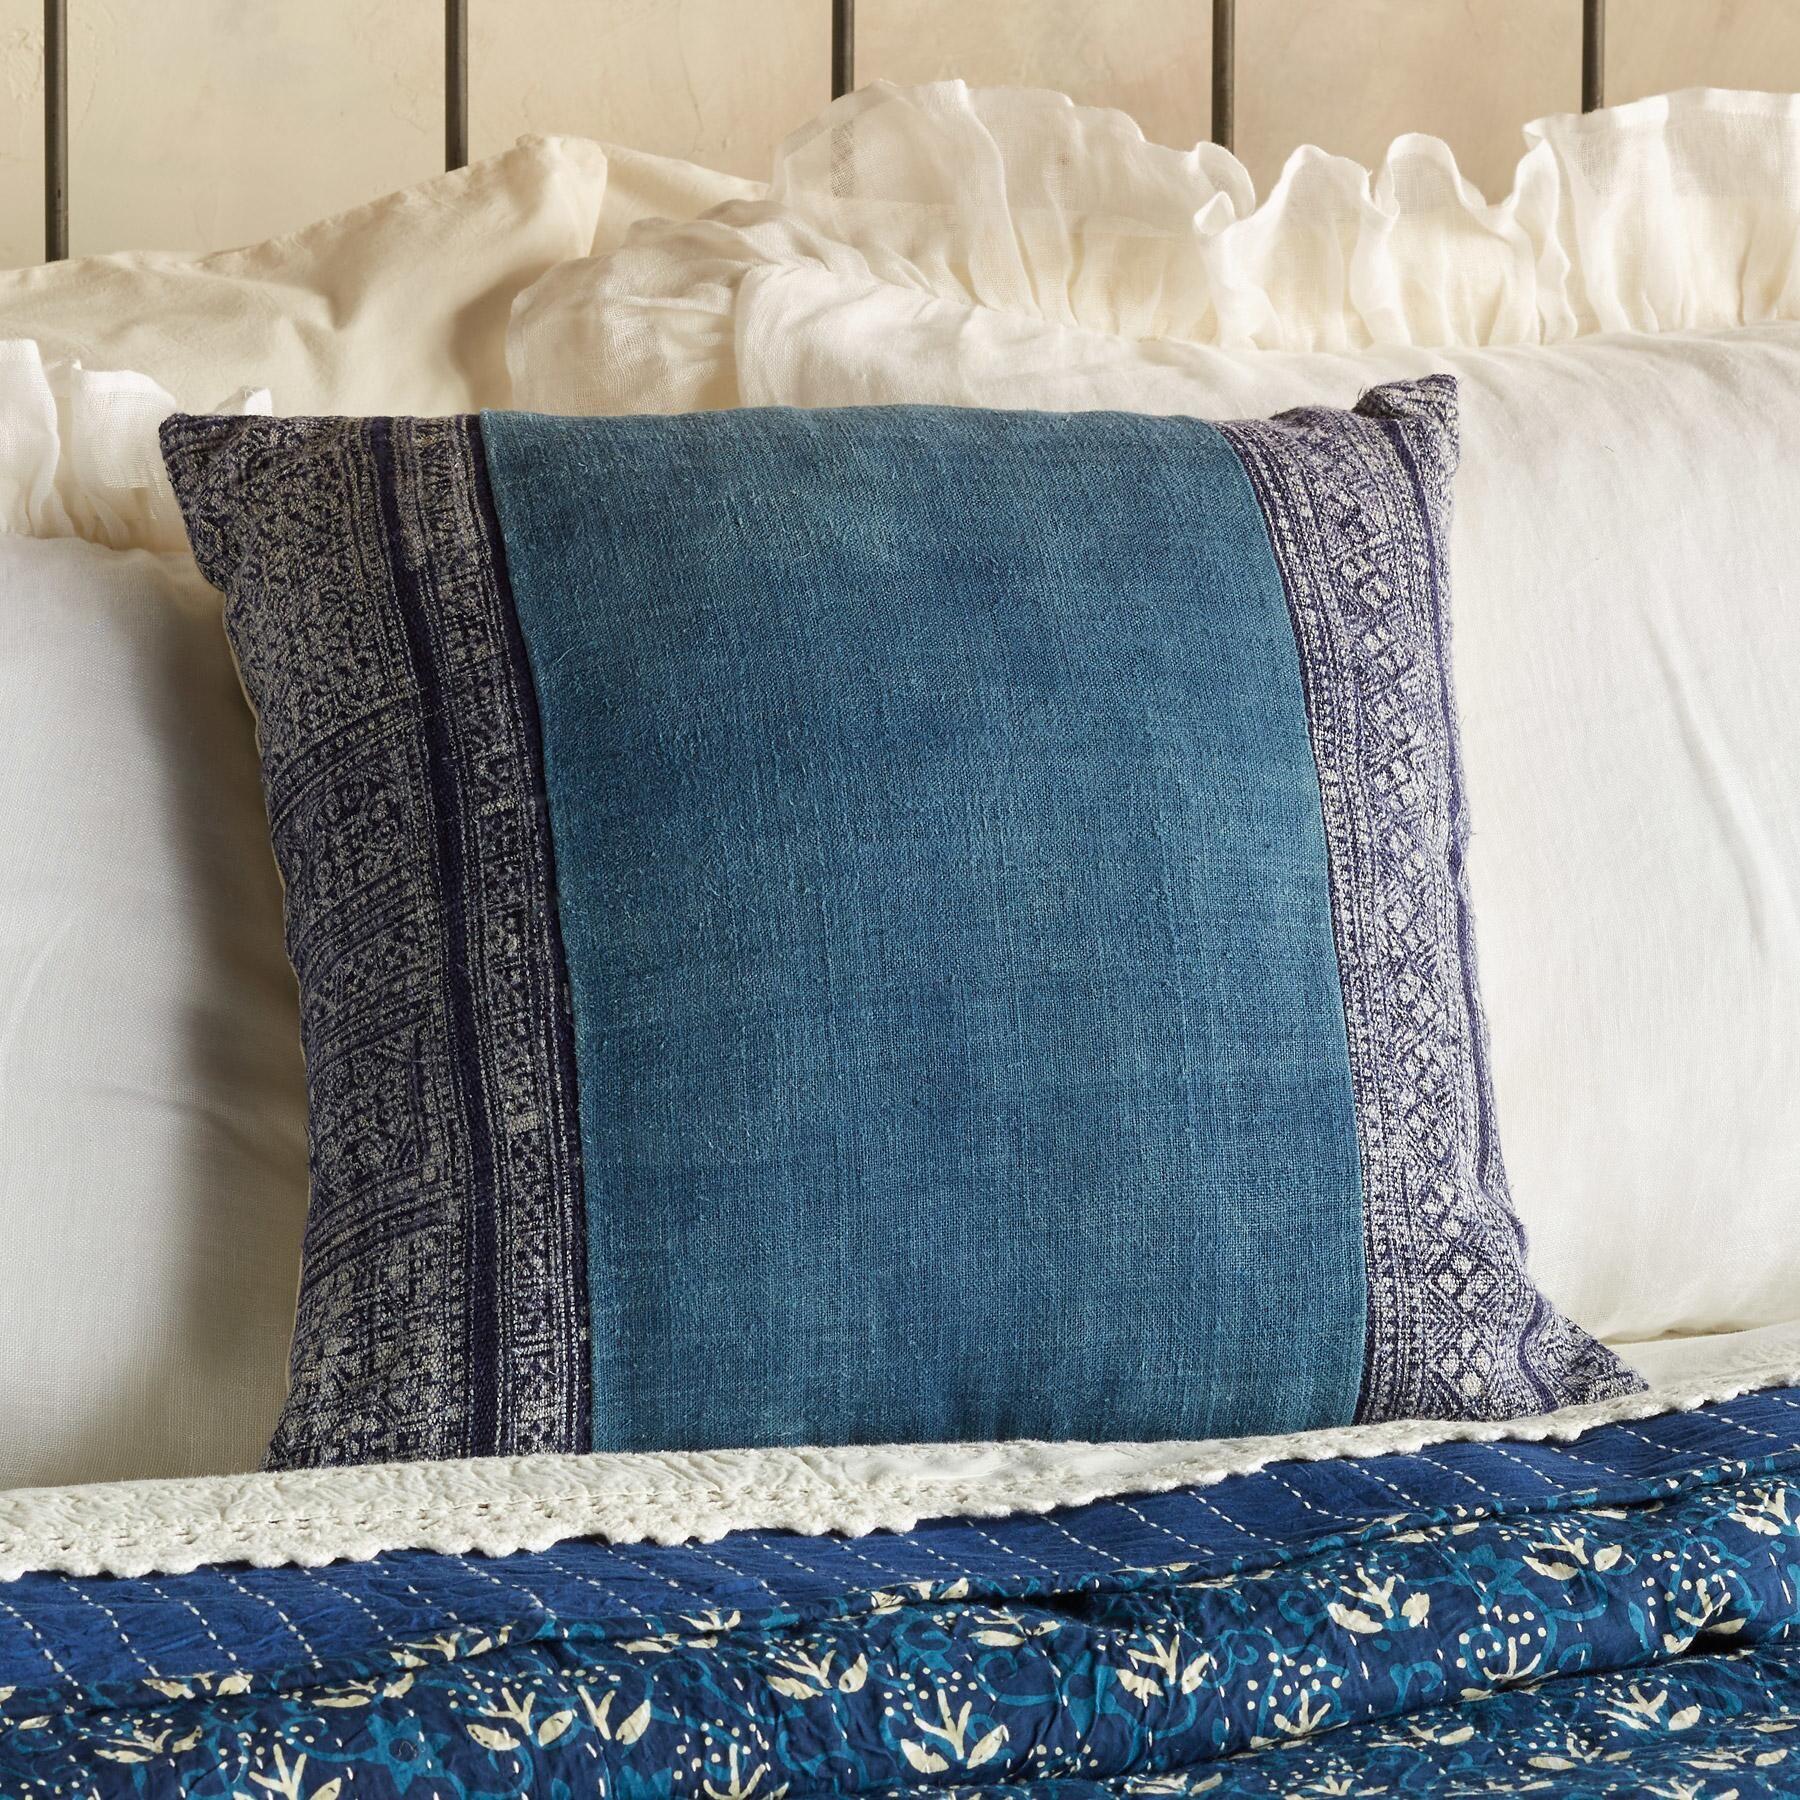 Vintage batik square pillow this oneofakind pillow is